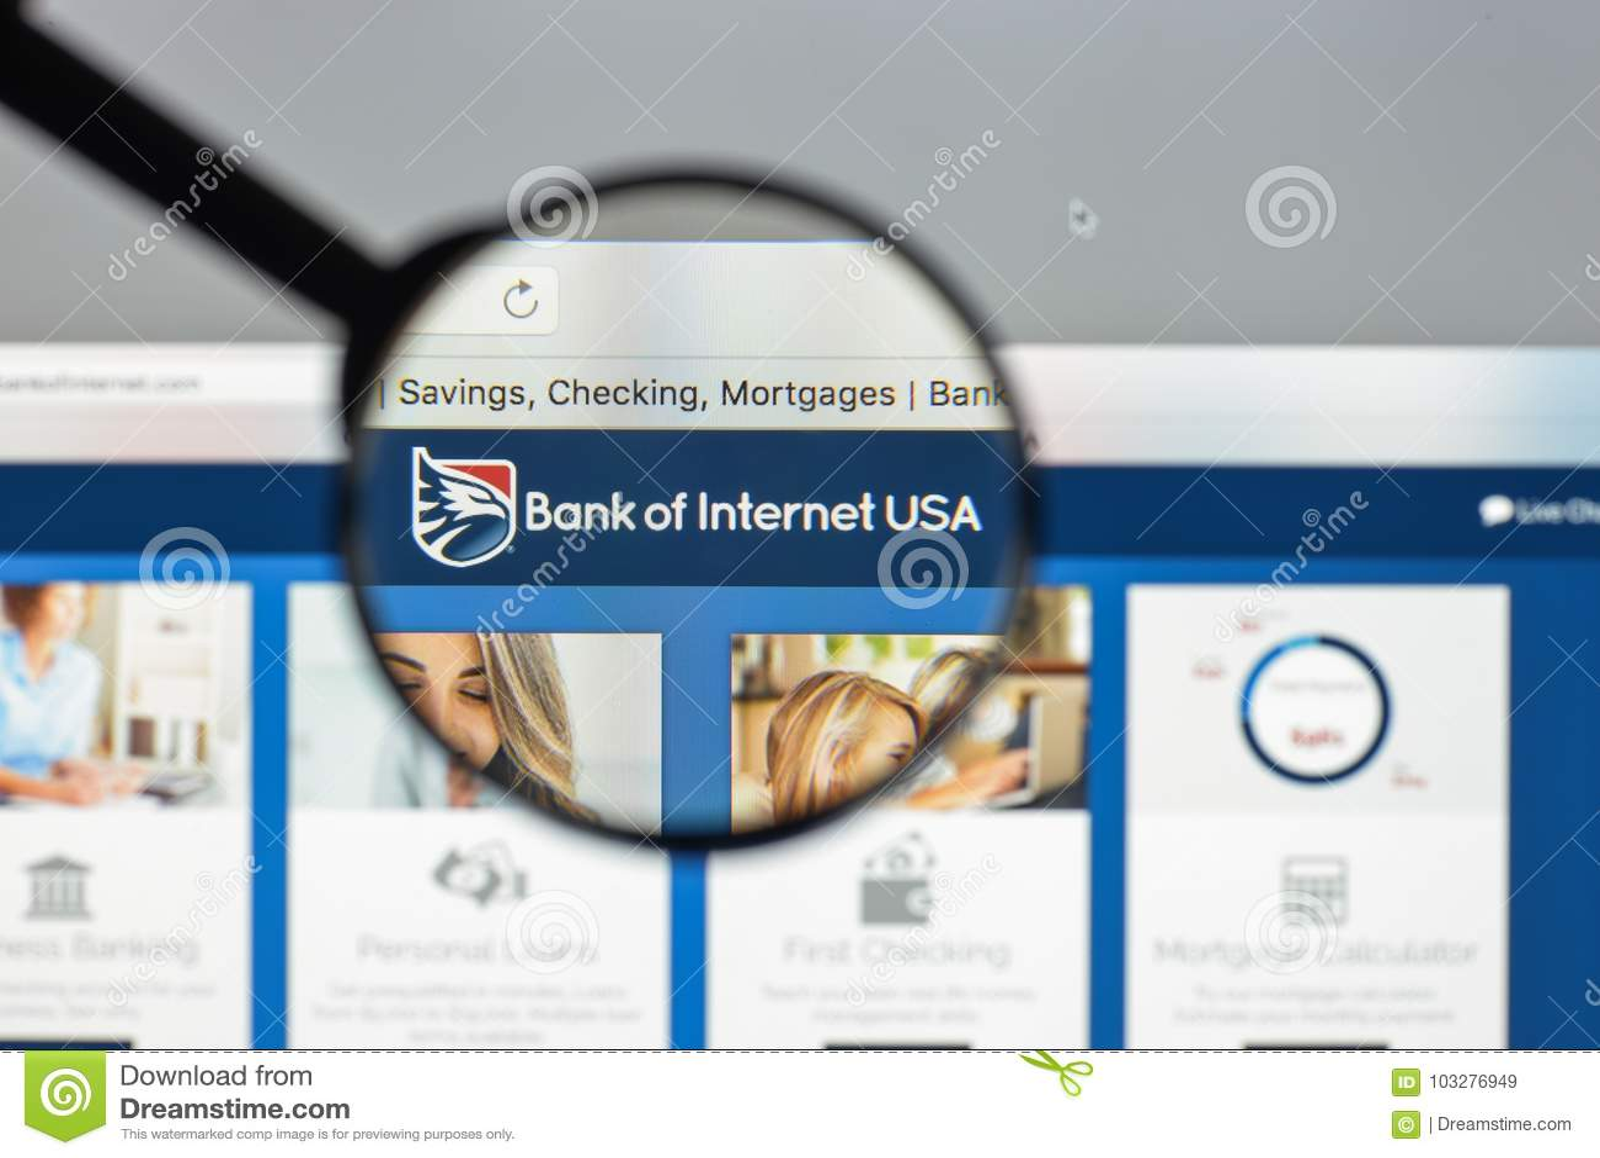 us central bank official website